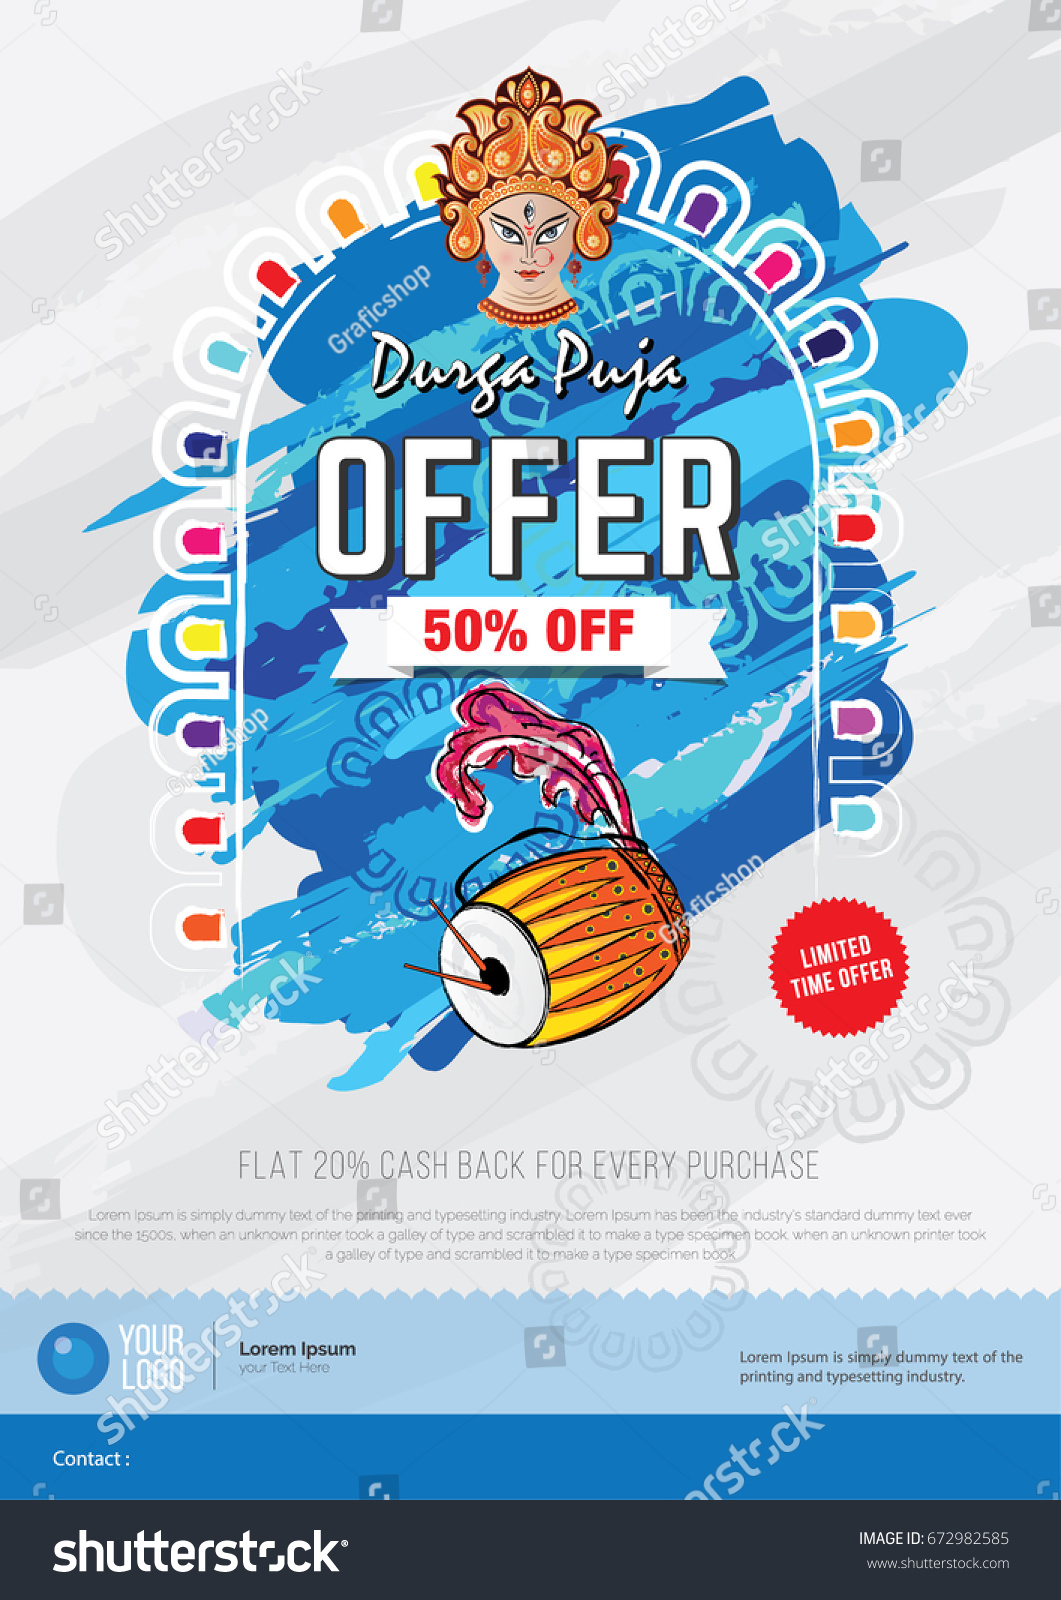 durga puja offer poster design template のベクター画像素材